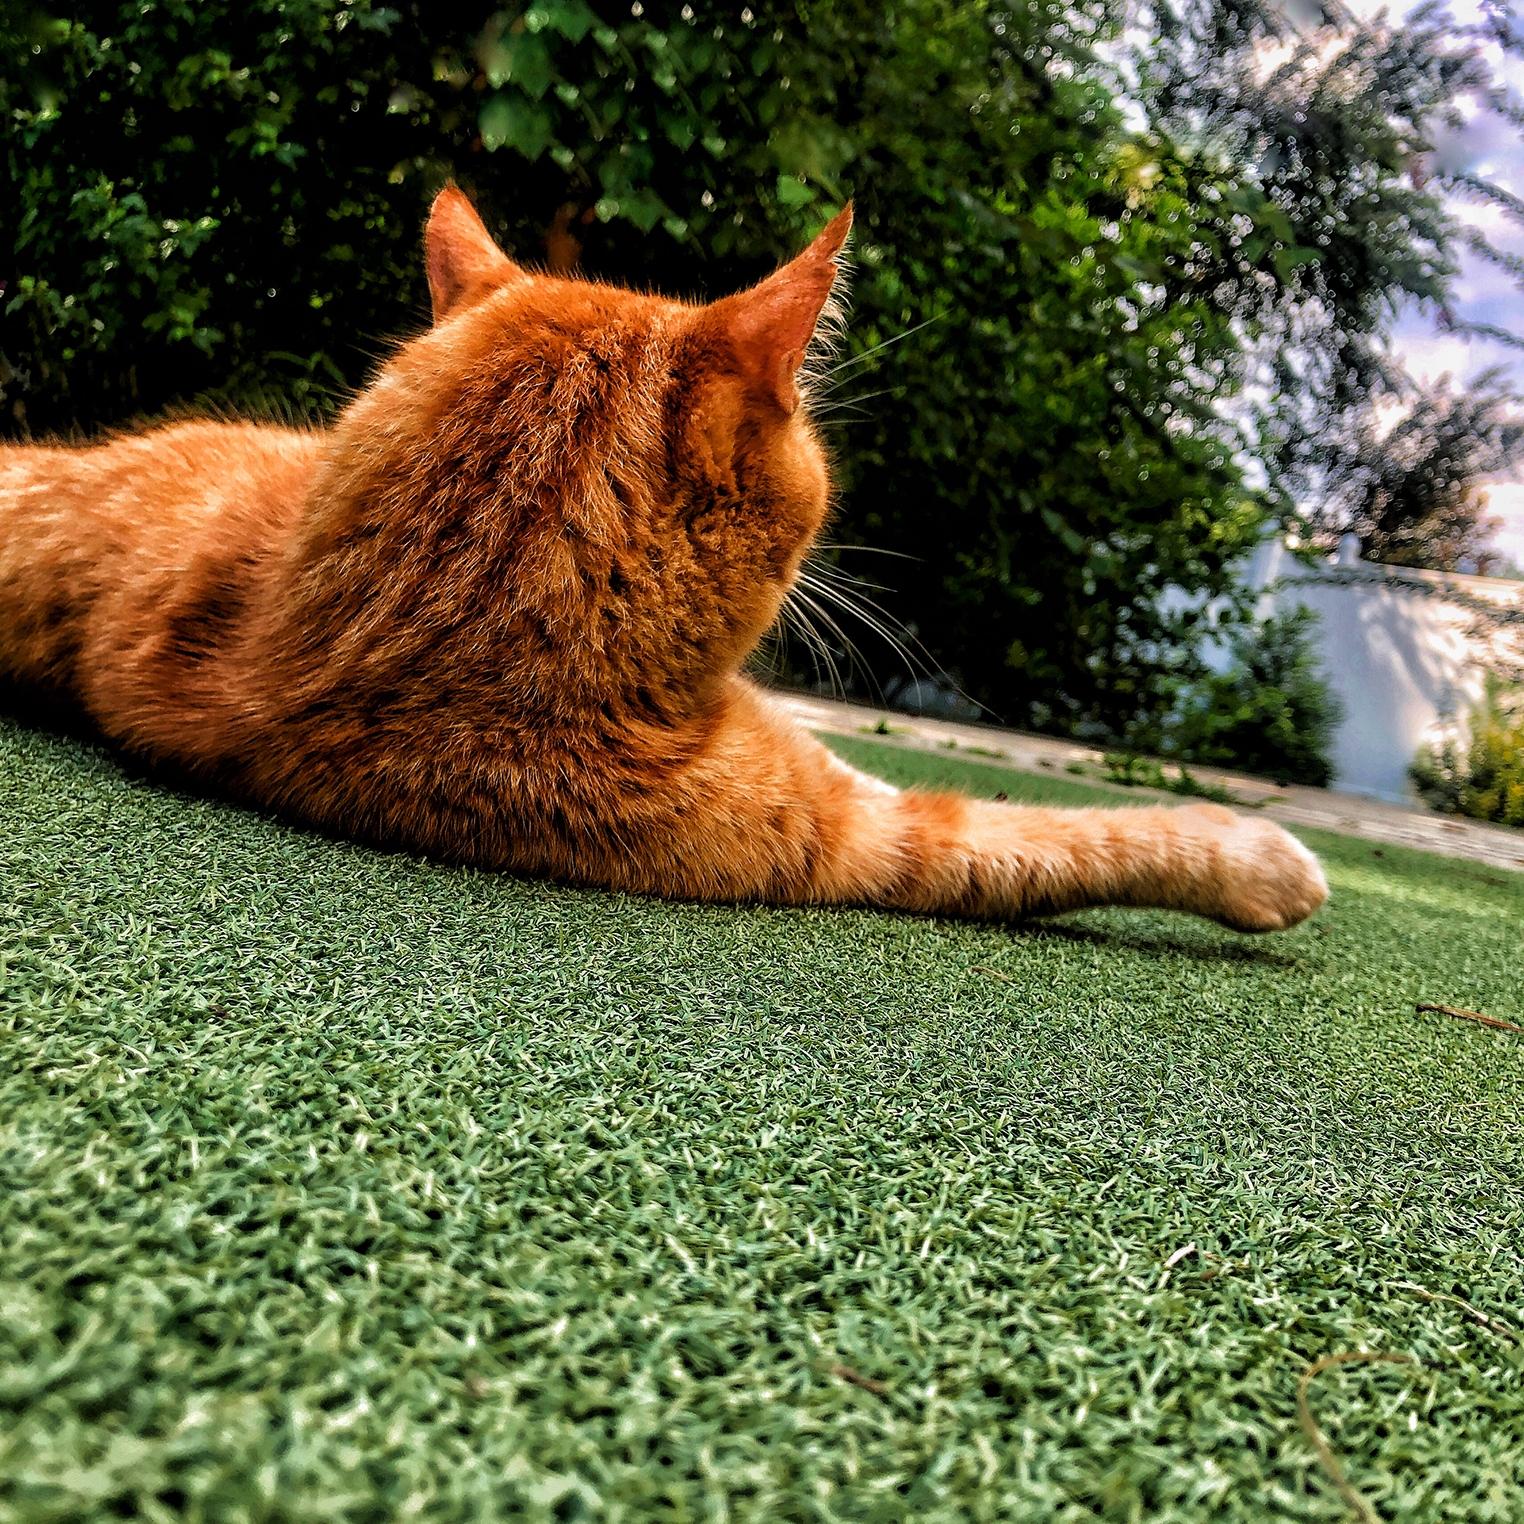 Yellow cat enjoying artificial grass putting greens